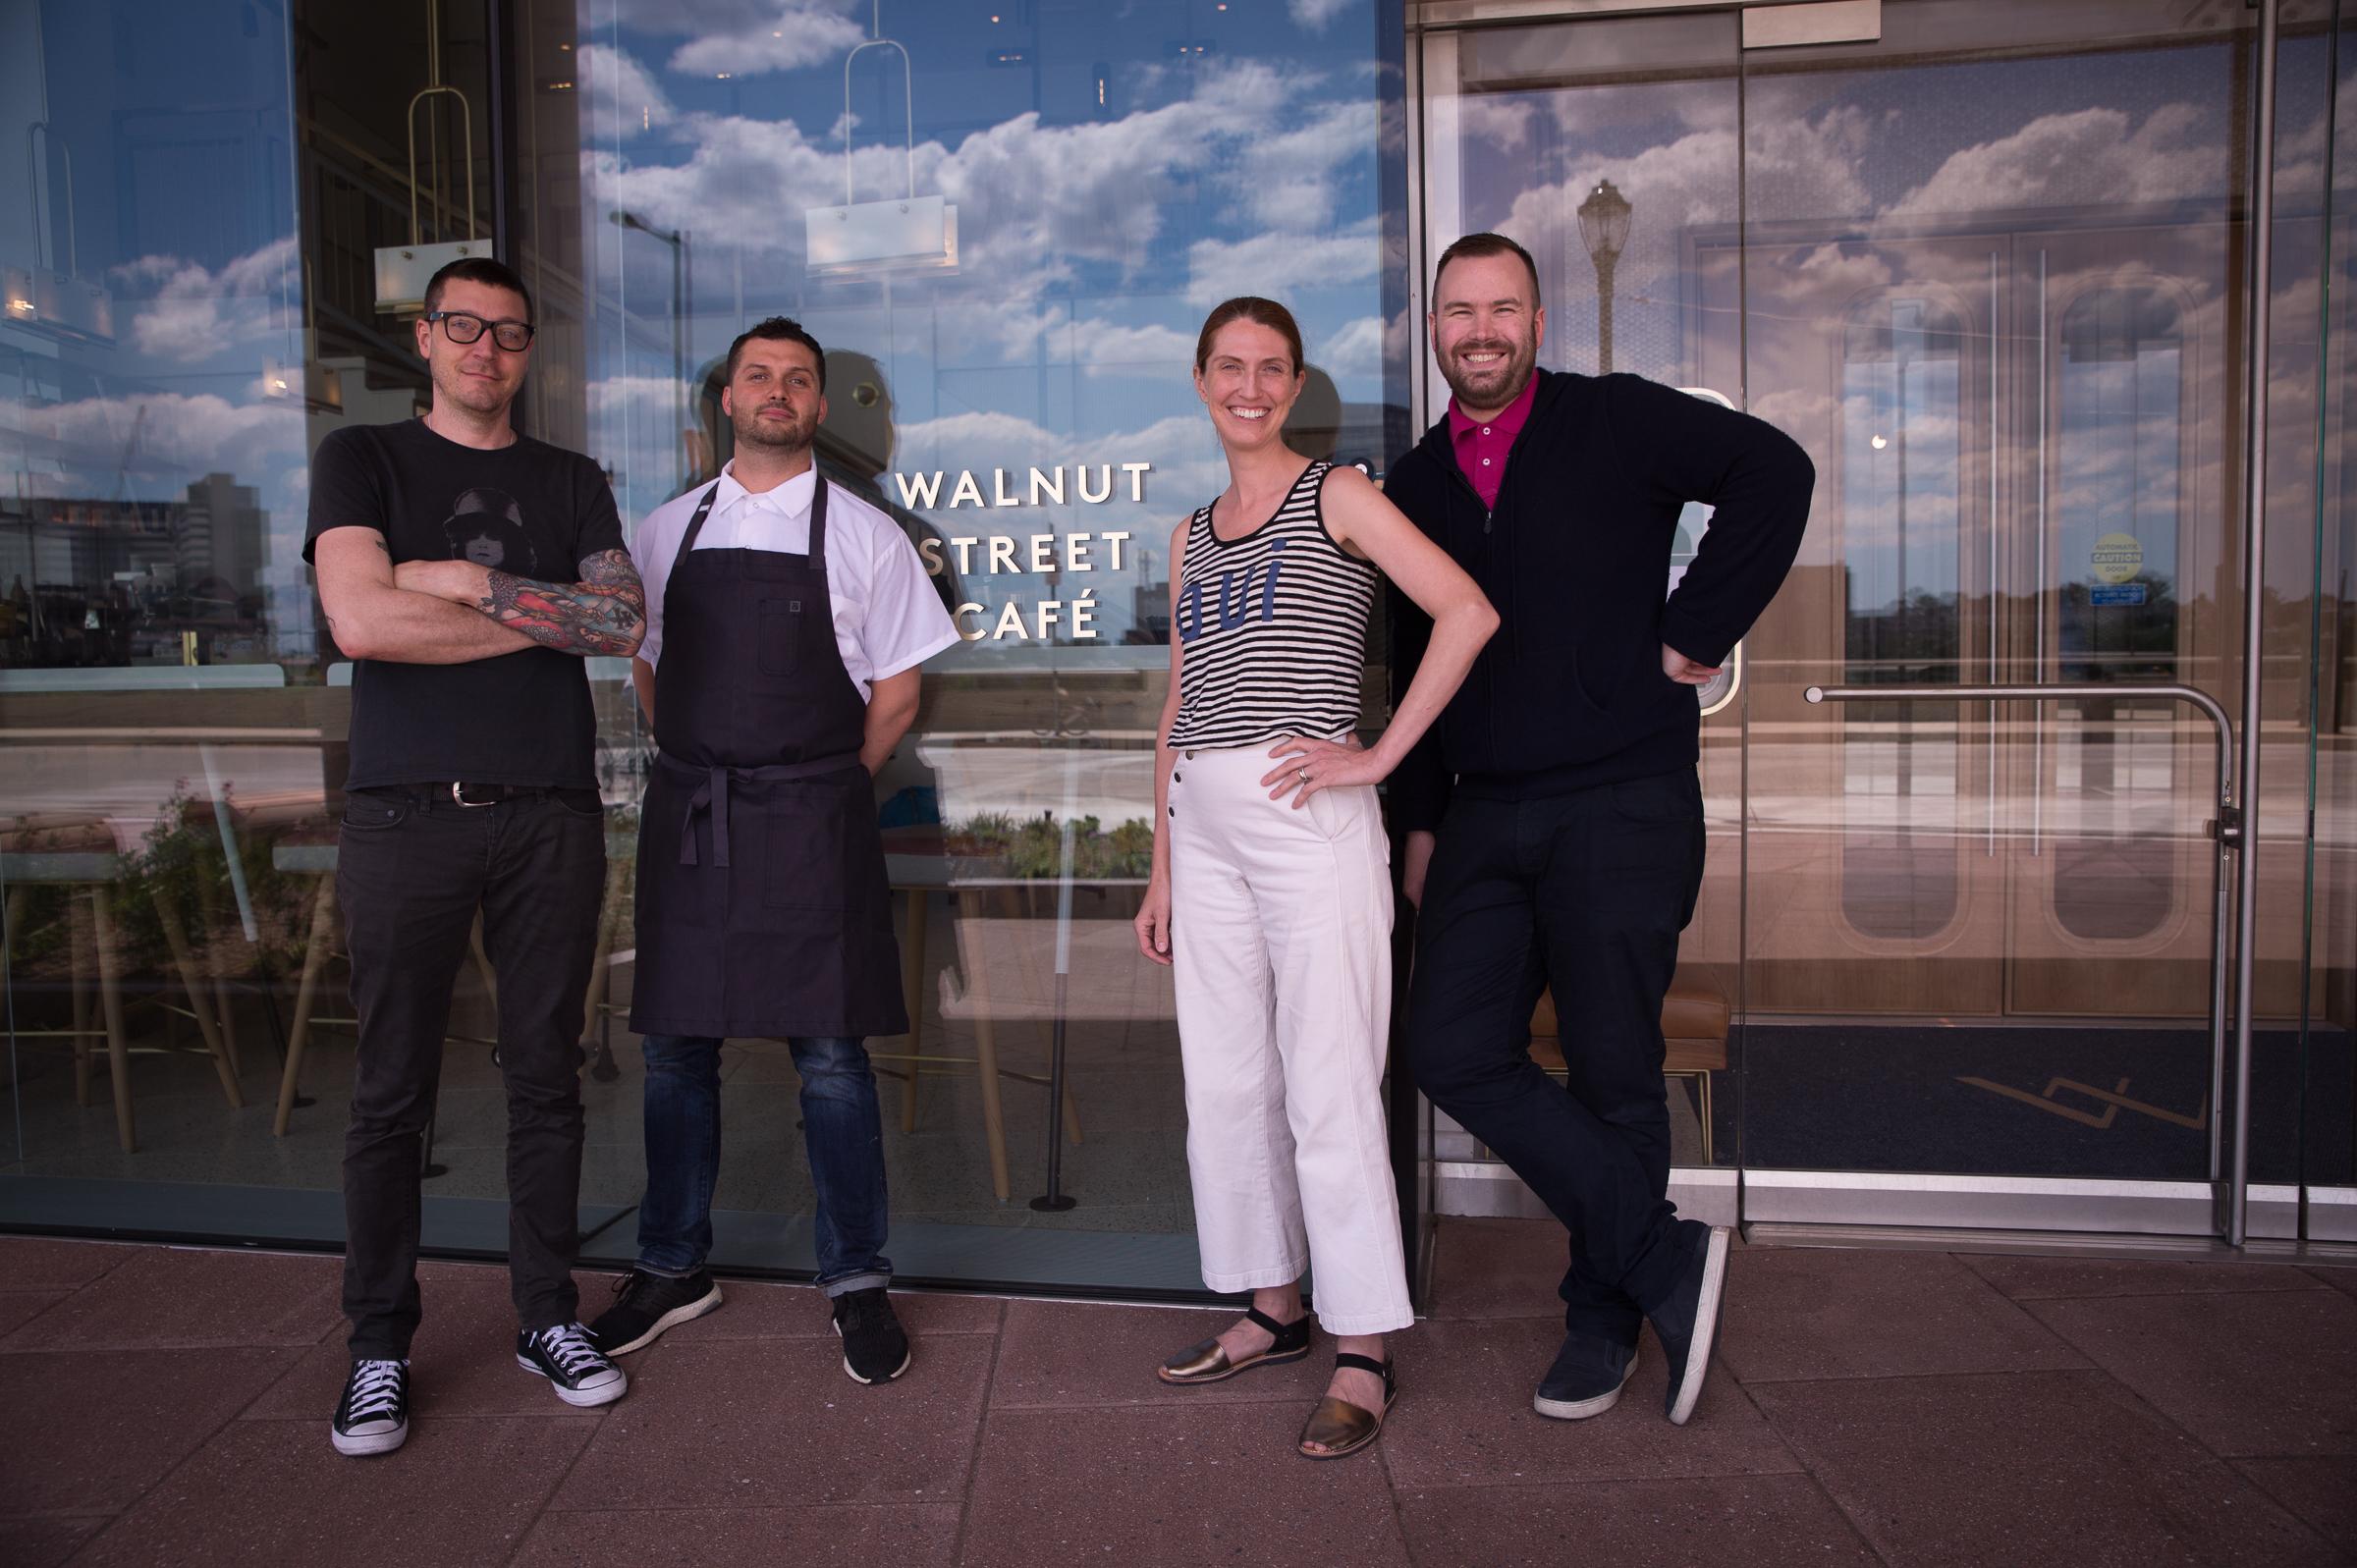 Operator Patrick Cappiello, chef Daniel Eddy, pastry chef Melissa Weller, and operator Branden McRill at the new Walnut Street Cafe.